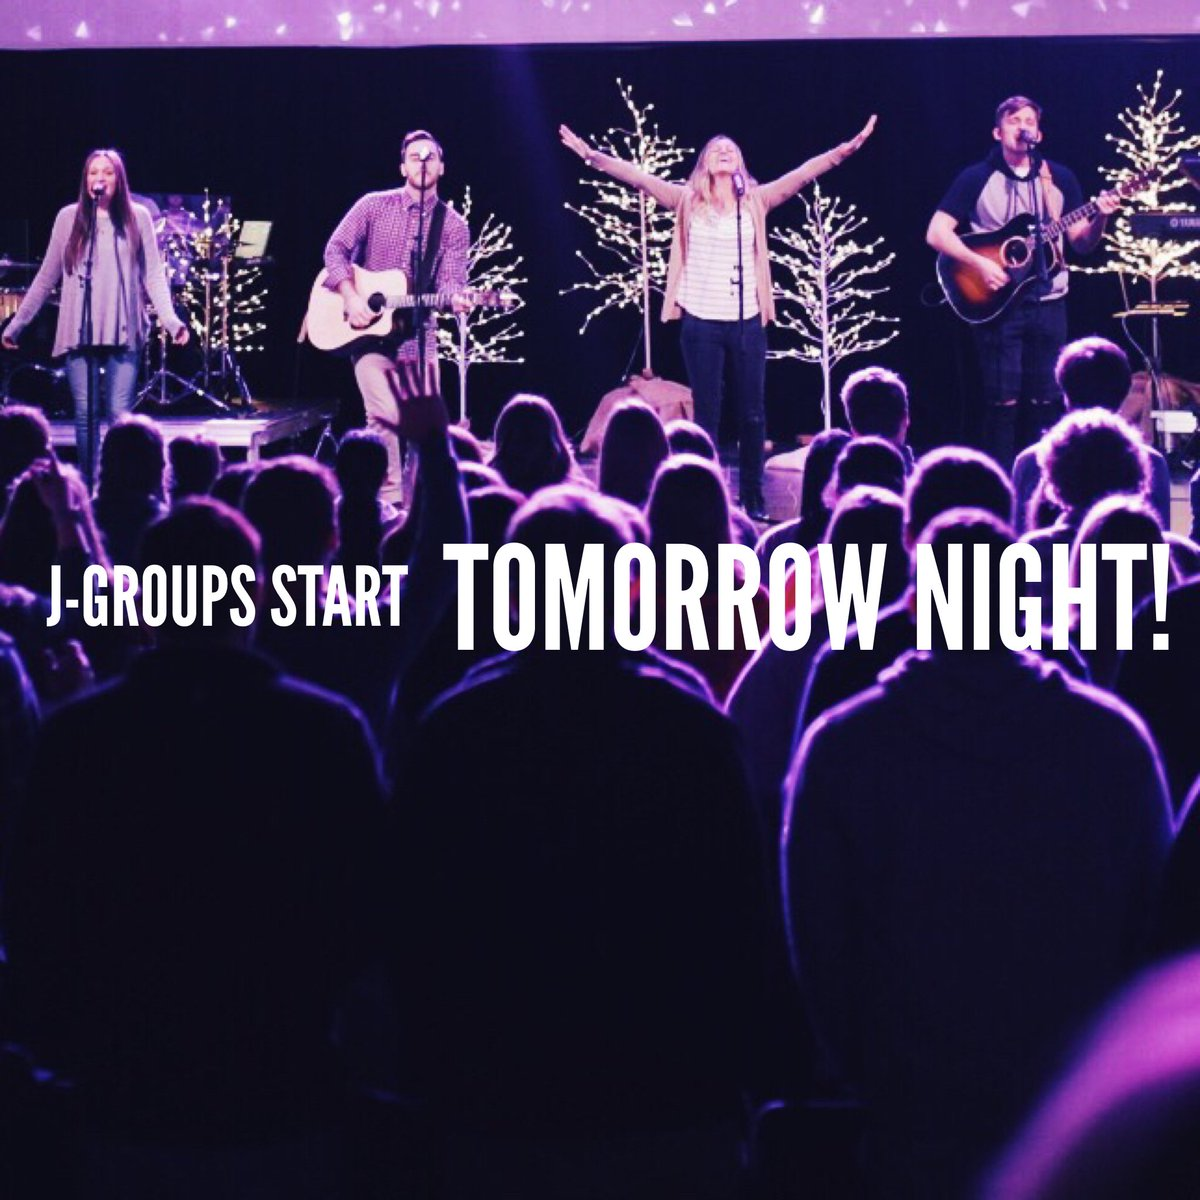 jgroups hashtag on Twitter